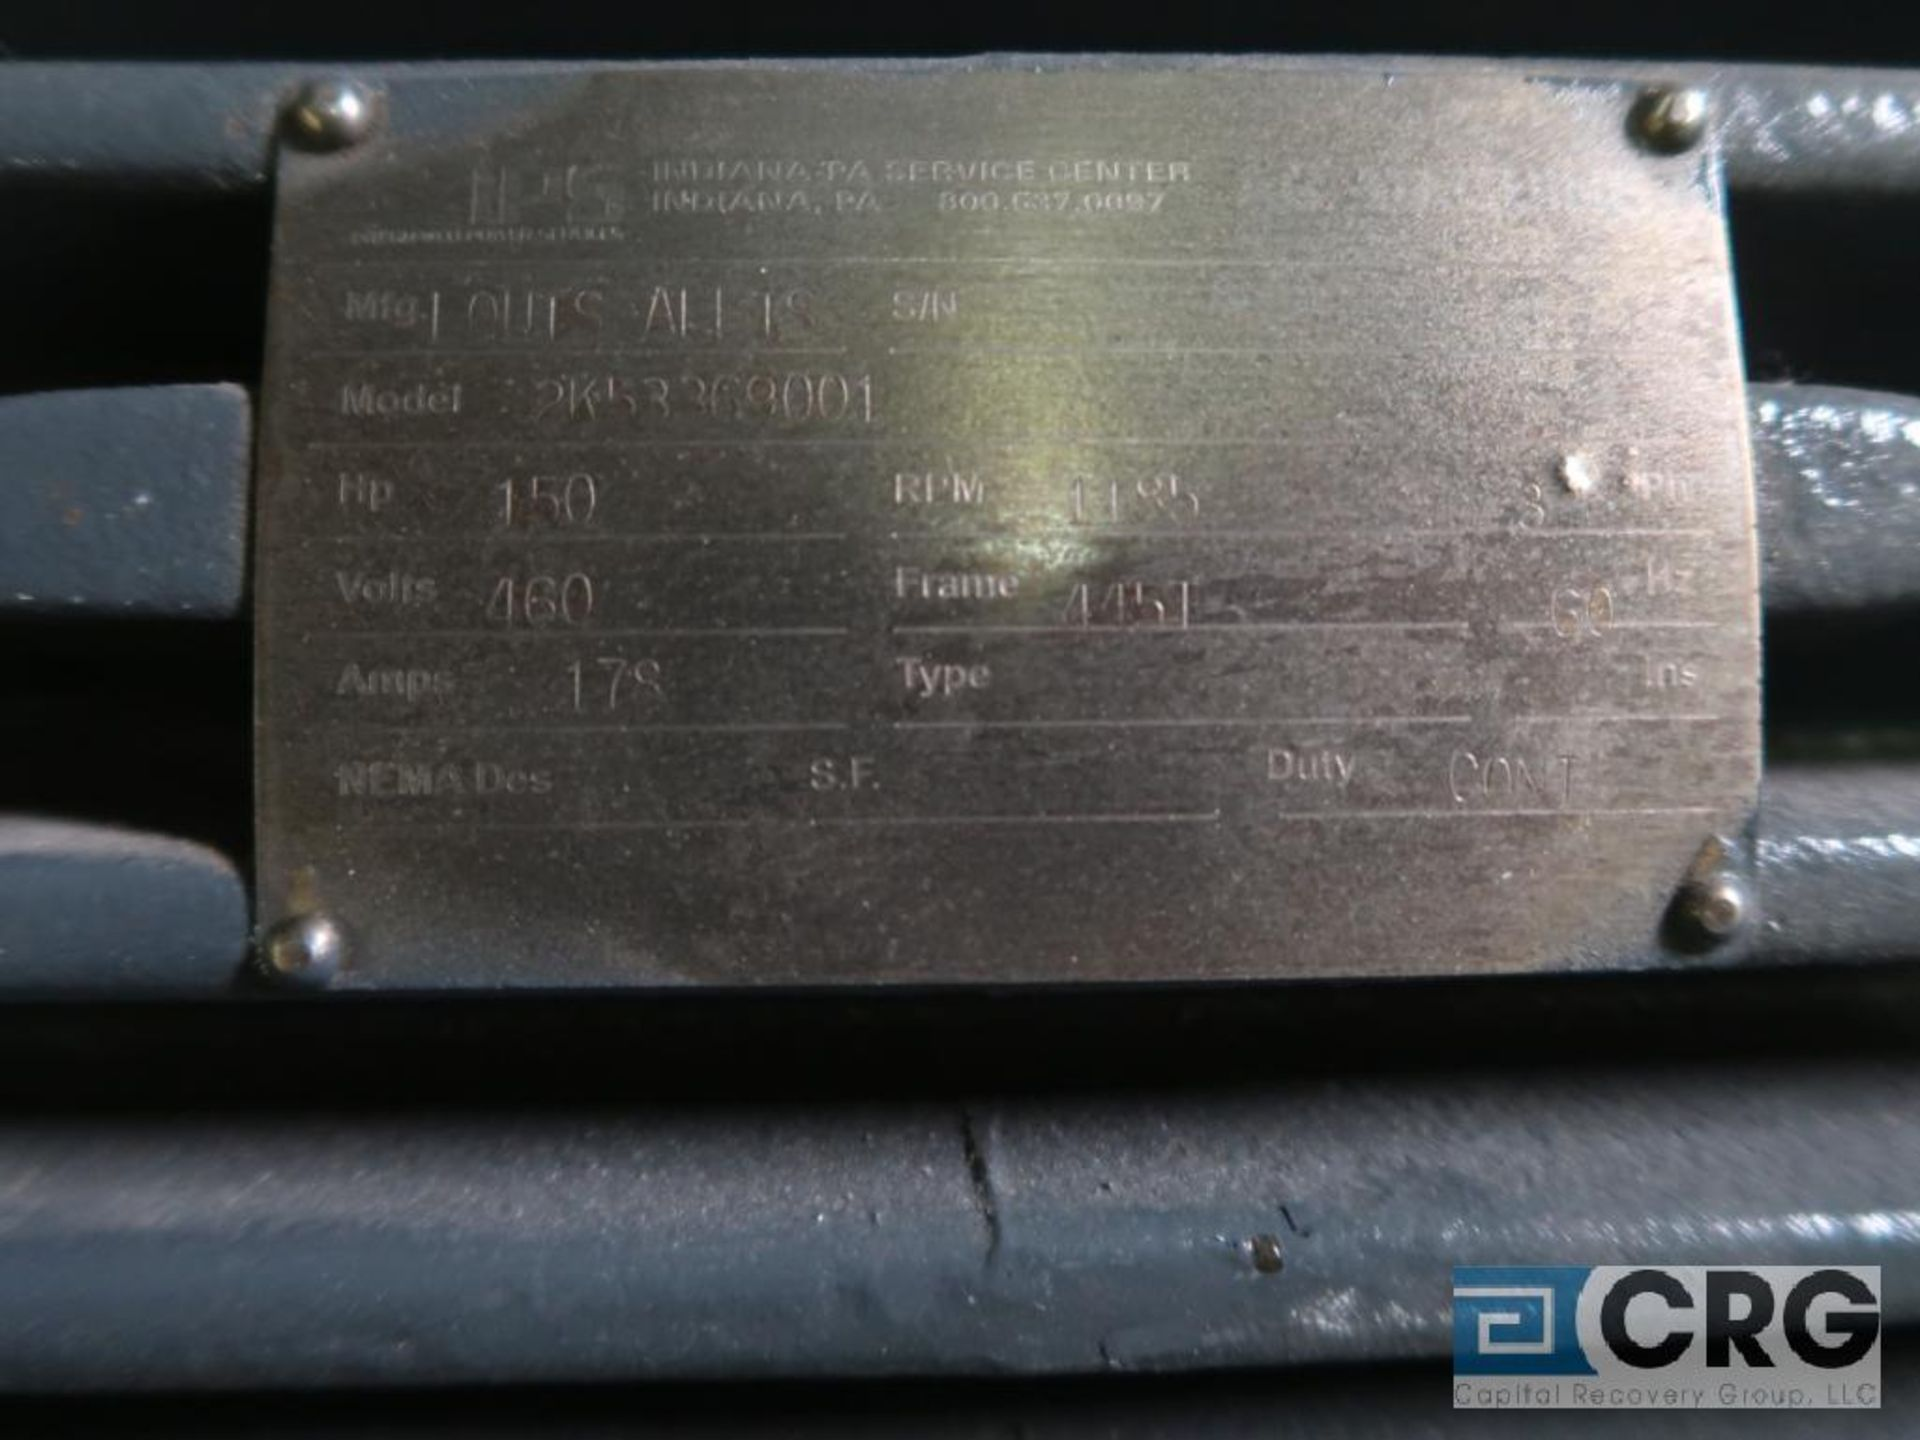 Louis-Allis electric DC motor, 150 HP, 1,185 RPMs, 460 volt, 3 ph., 445T frame (Finish Building) - Image 2 of 2